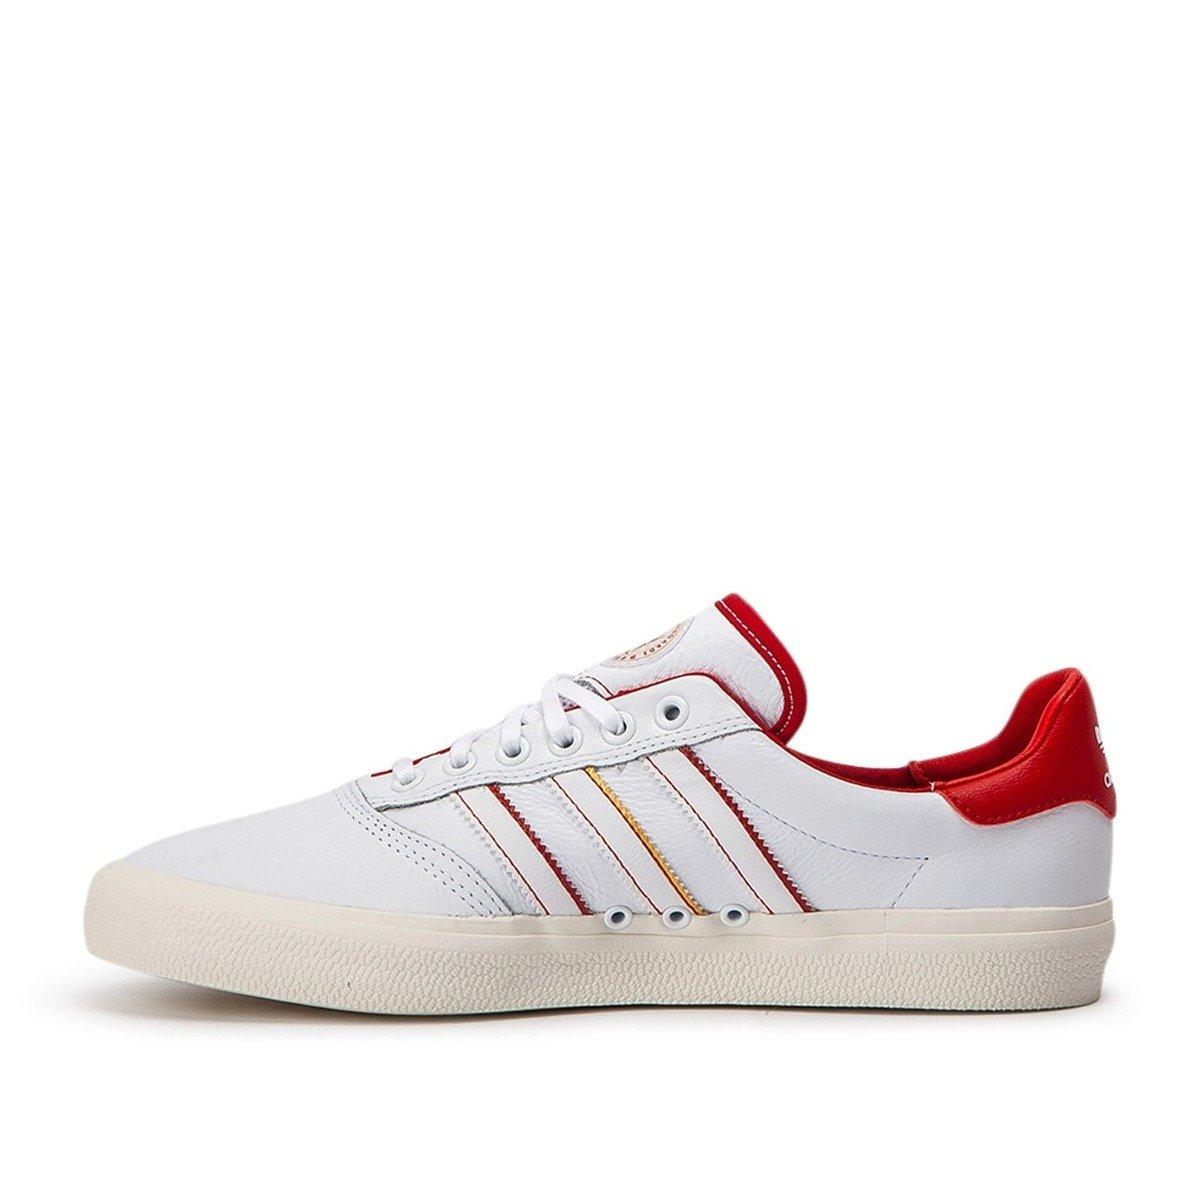 variedad de estilos de 2019 60% barato venta barata ee. adidas 3mc x evisen white | Shoes \ Adidas Skateboarding Brands ...